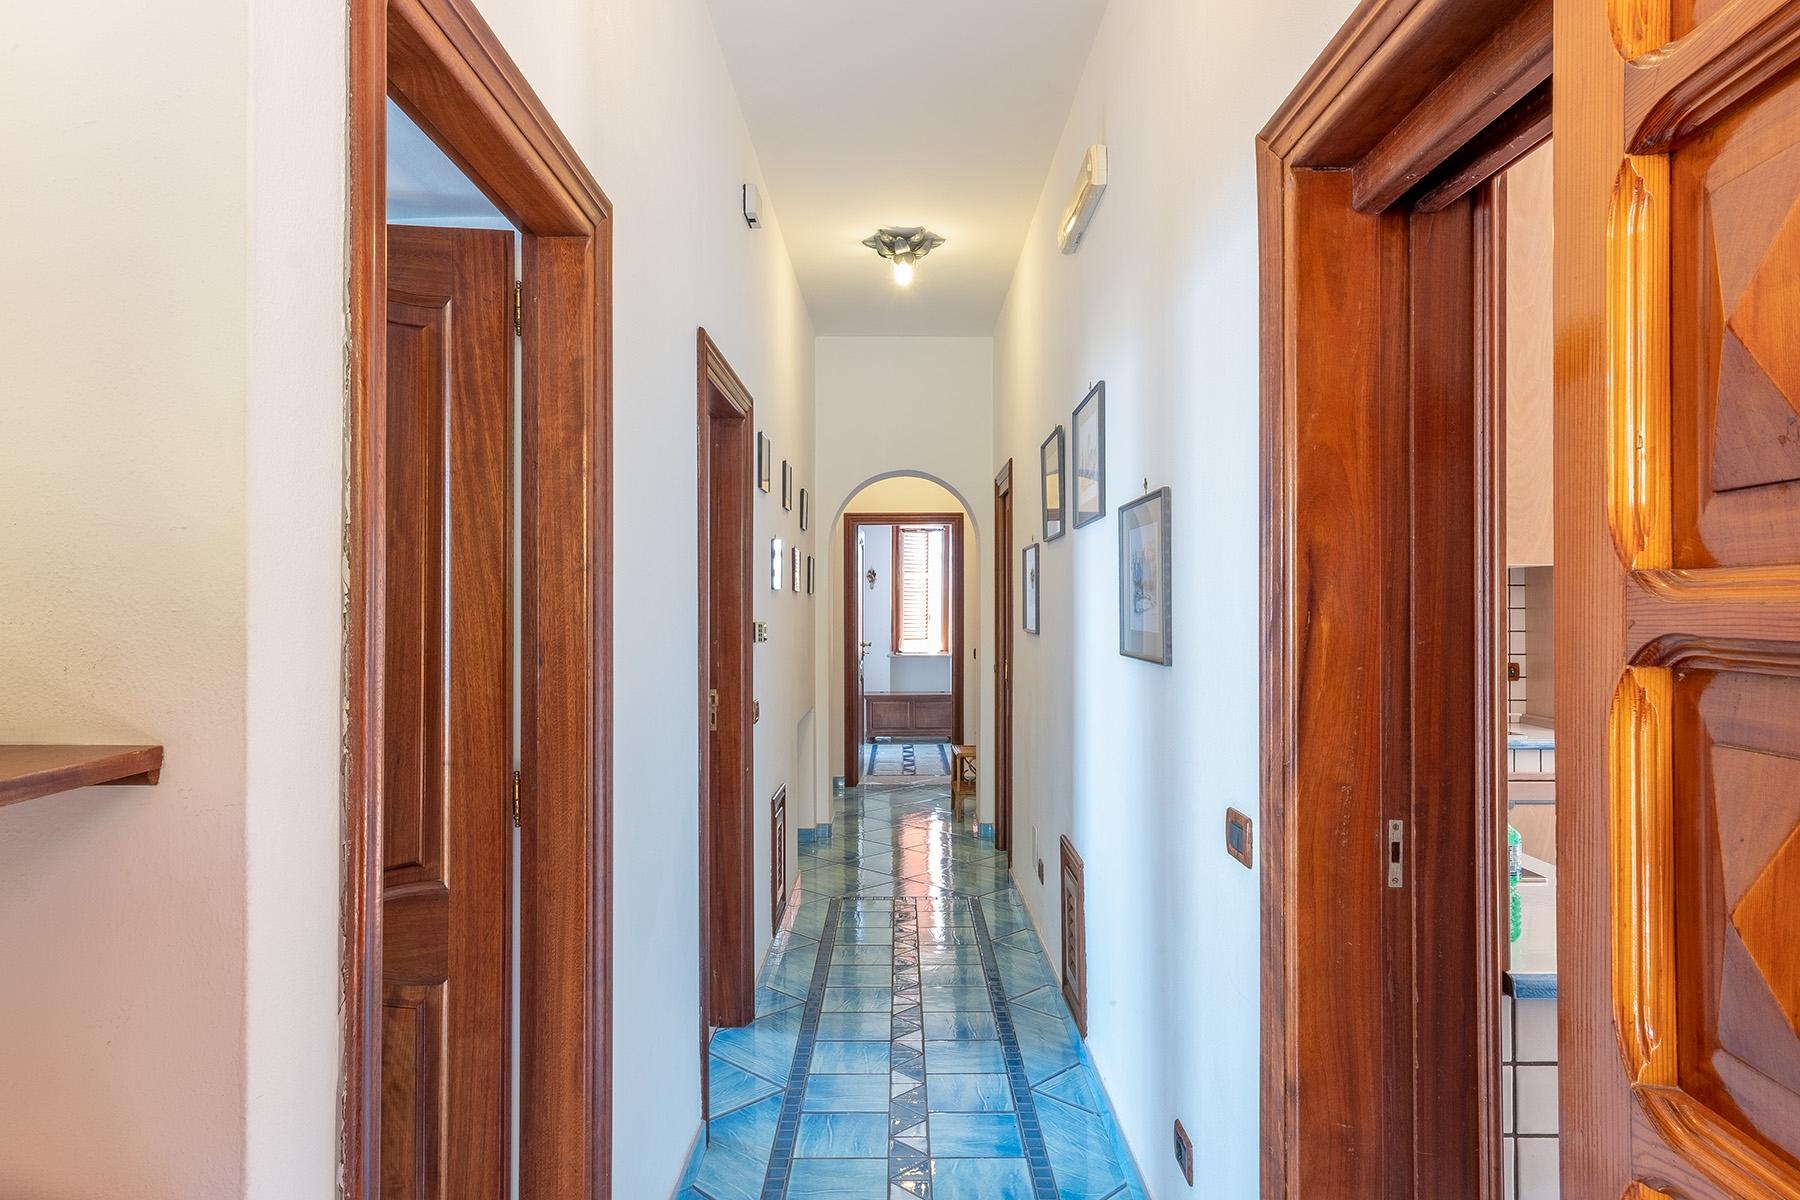 Villa in Vendita a Ischia: 5 locali, 138 mq - Foto 21